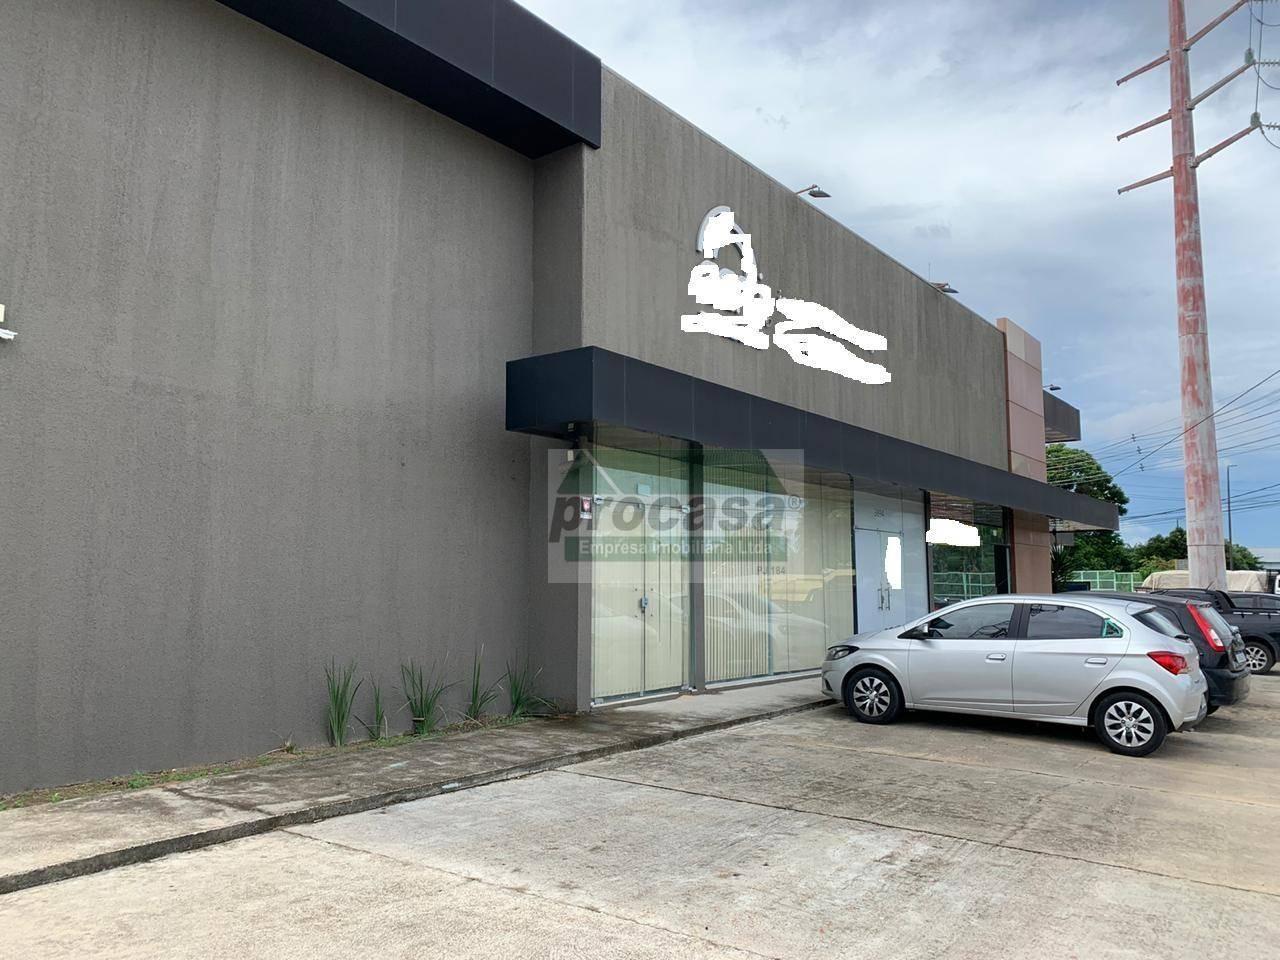 Loja para alugar, 165 m² por R$ 6.000/mês - Distrito Industrial I - Manaus/AM